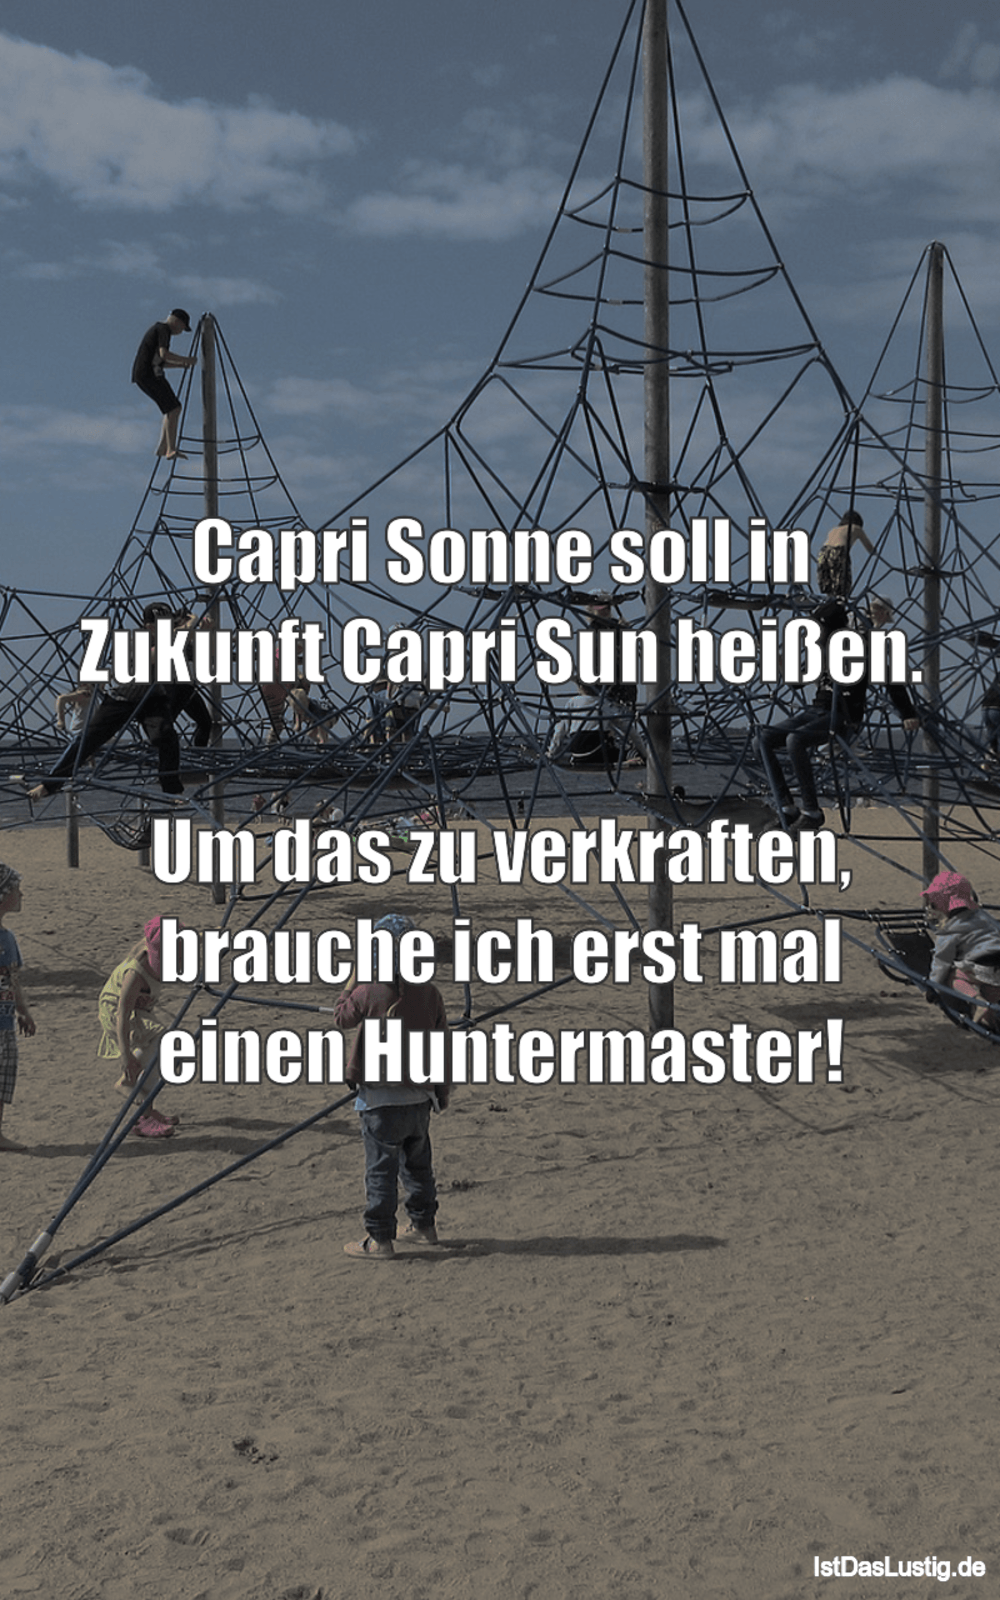 Lustiger BilderSpruch - Capri Sonne soll in Zukunft Capri Sun heißen....